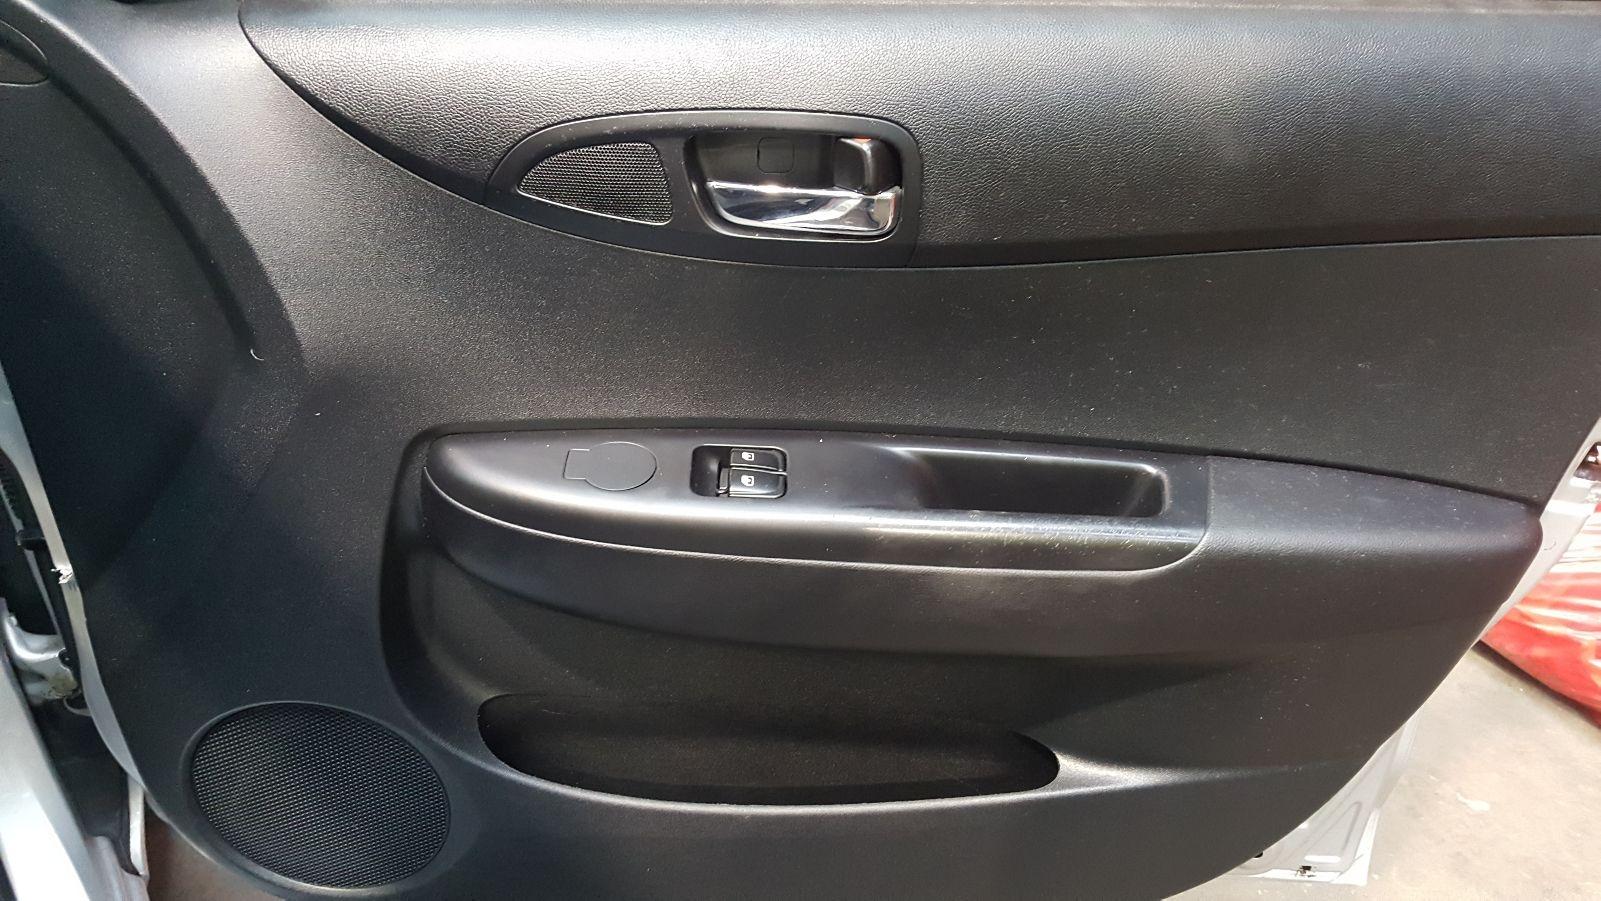 View Auto part Wiper Arm Hyundai I20 2009